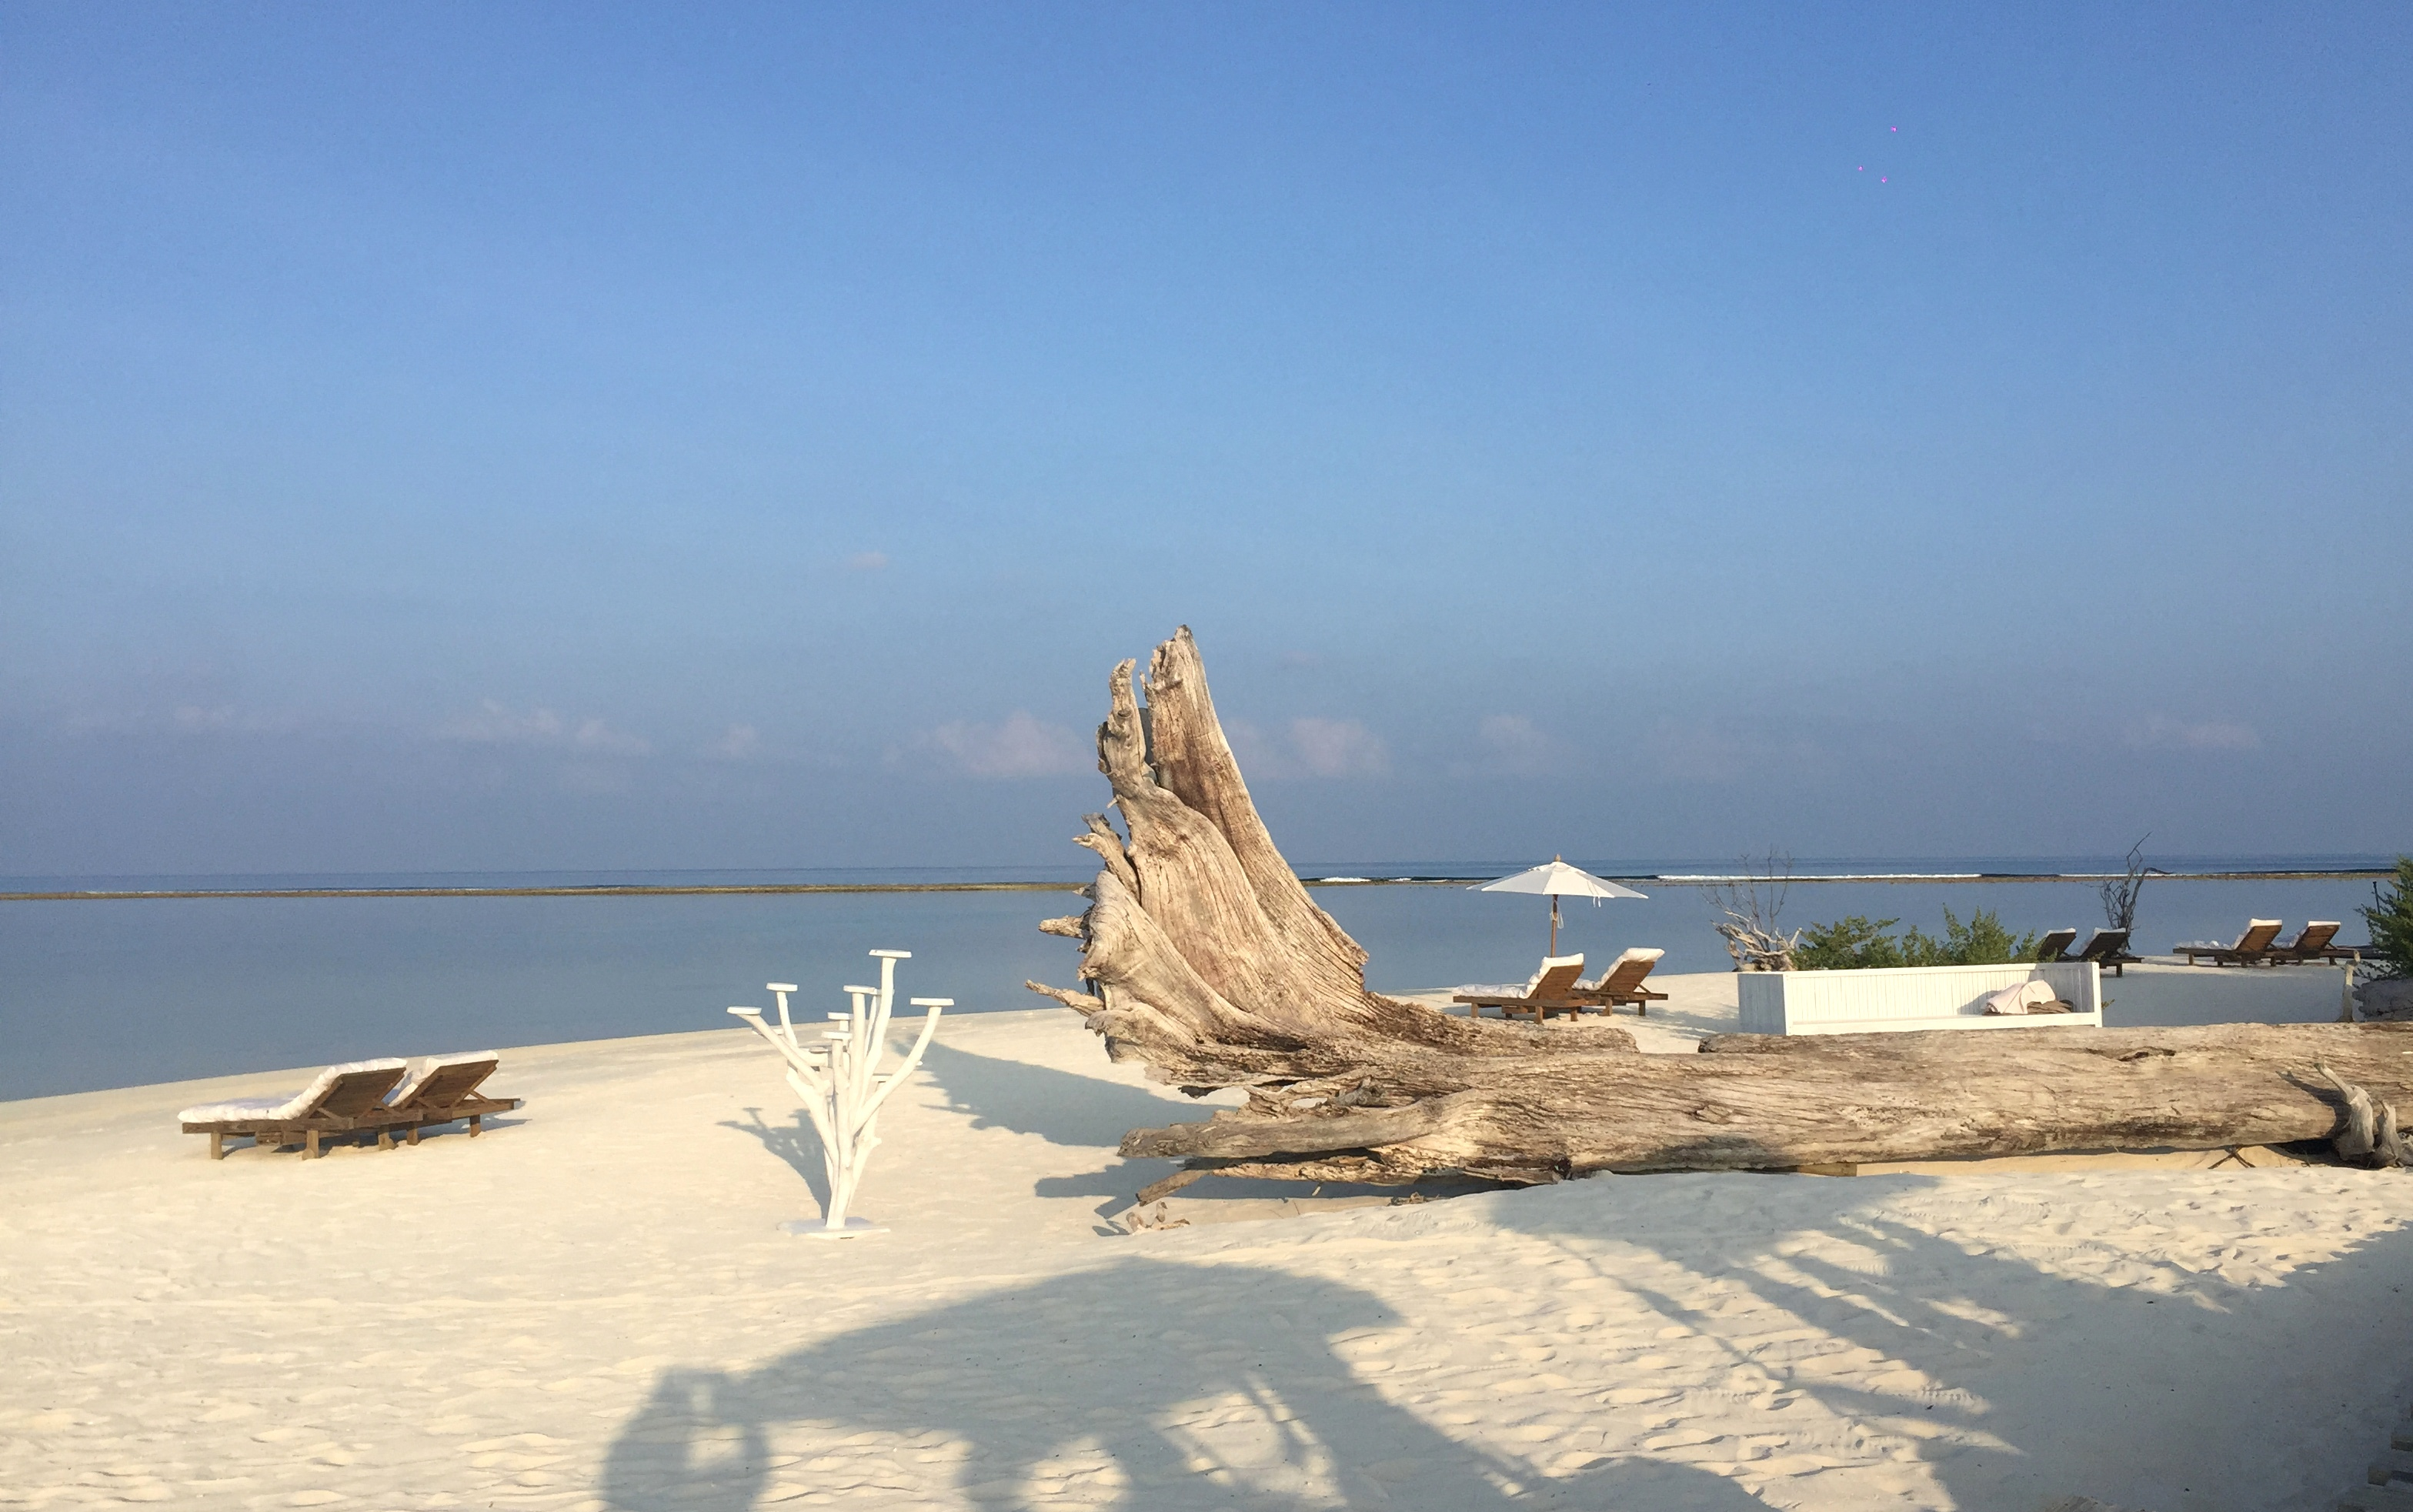 Zu Gast im neuen Soneva Jani Resort auf den Malediven strand sonne reisebericht new malediven honeymoon 2  TUI Berlin Reisebüro Malediven Soneva Jani Resort Strand